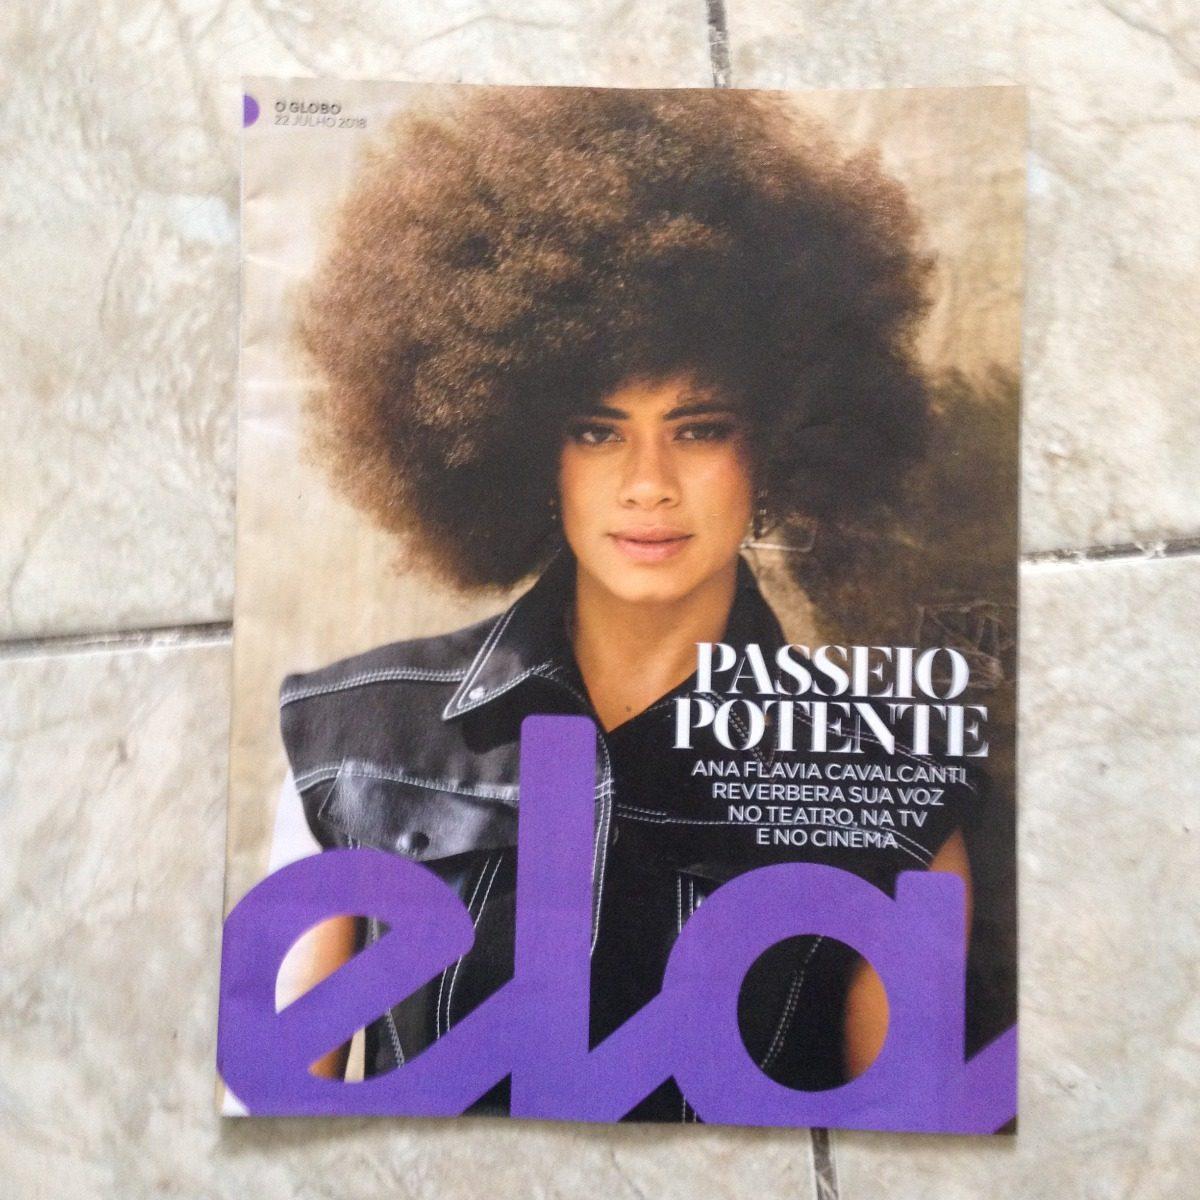 Ana Flavia Cavalcanti revista ela 22/08/2018 ana flavia cavalcanti voz e teatro